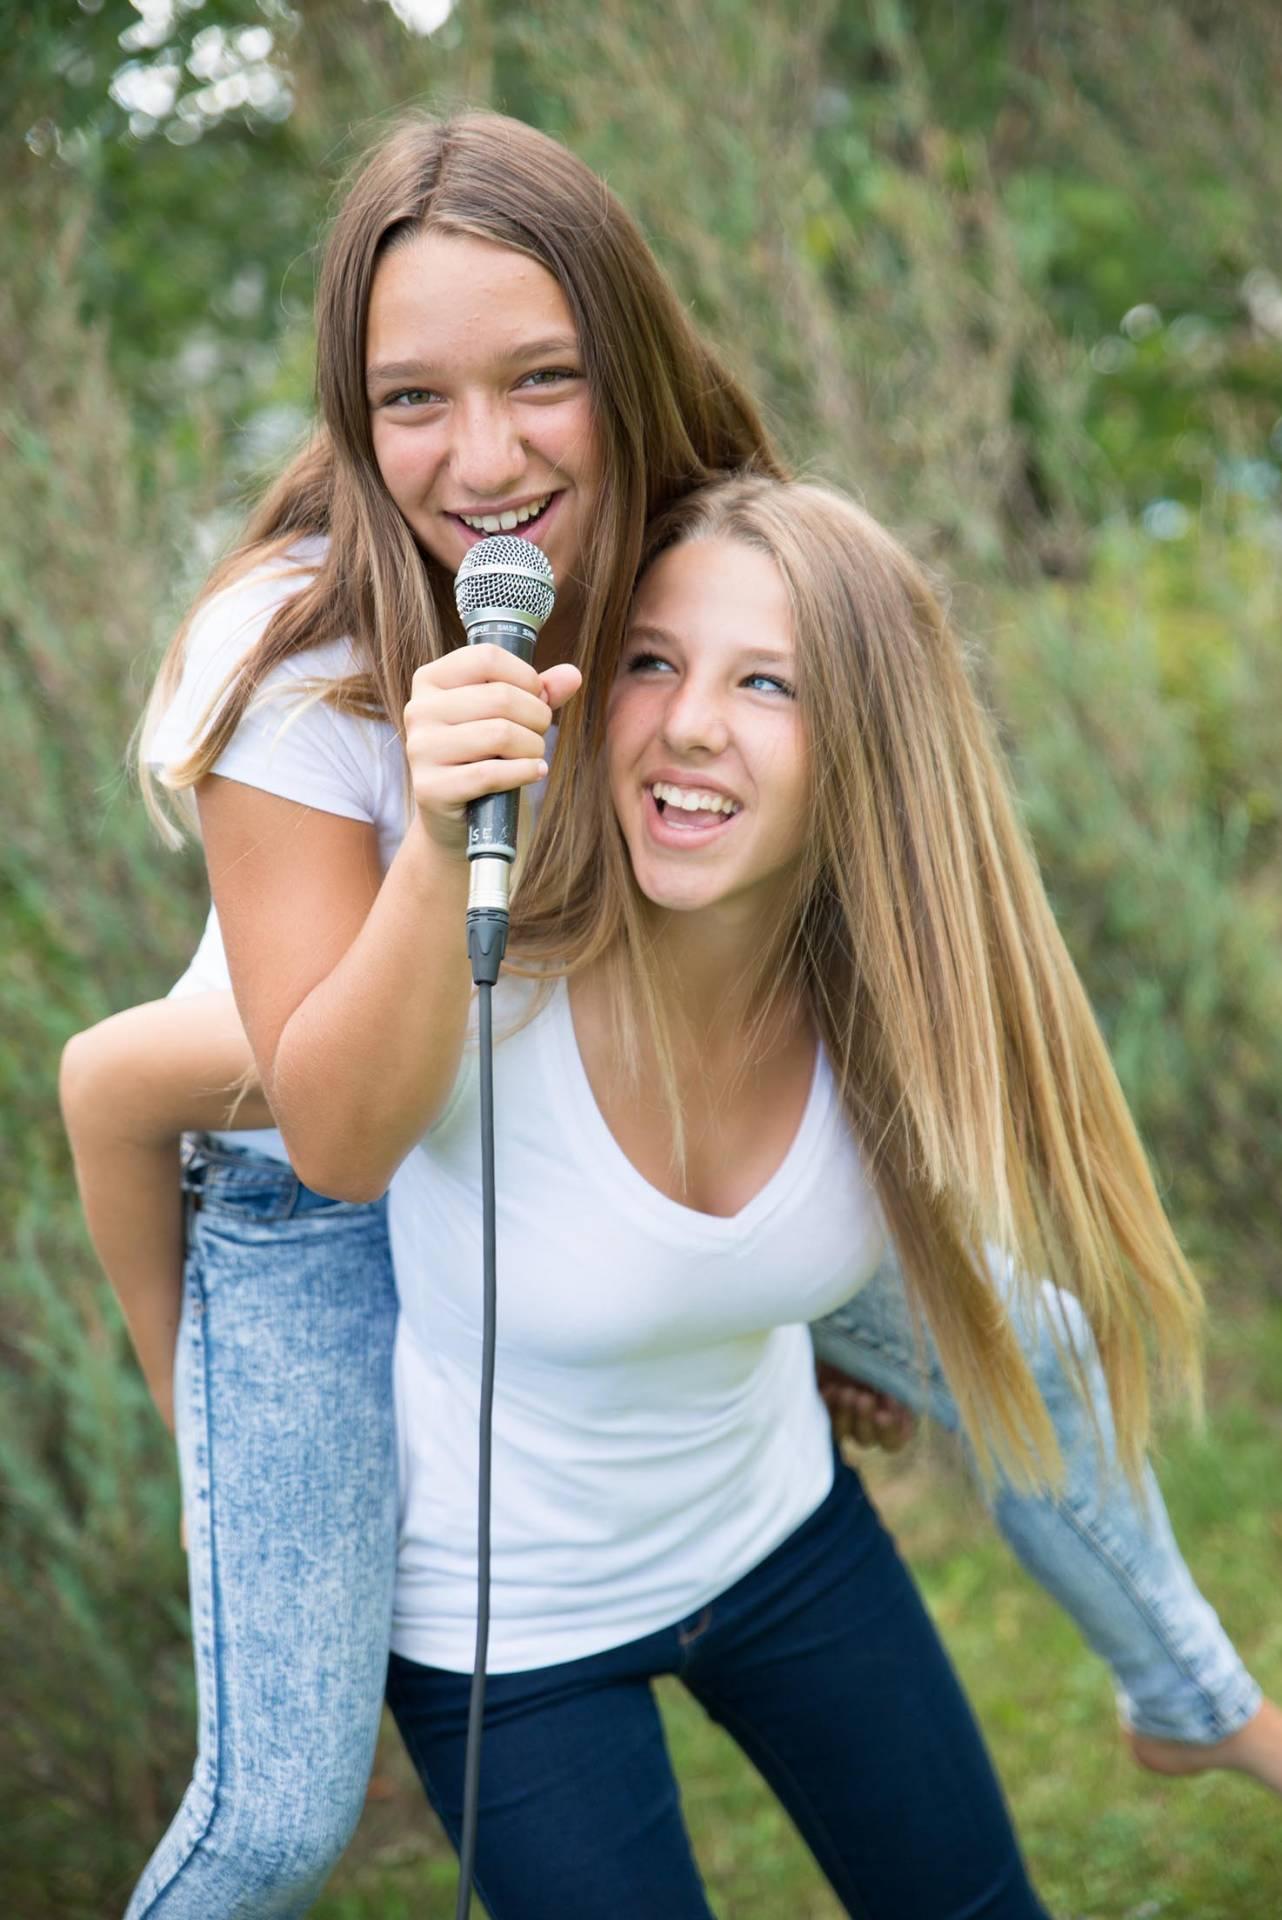 Chant populaire